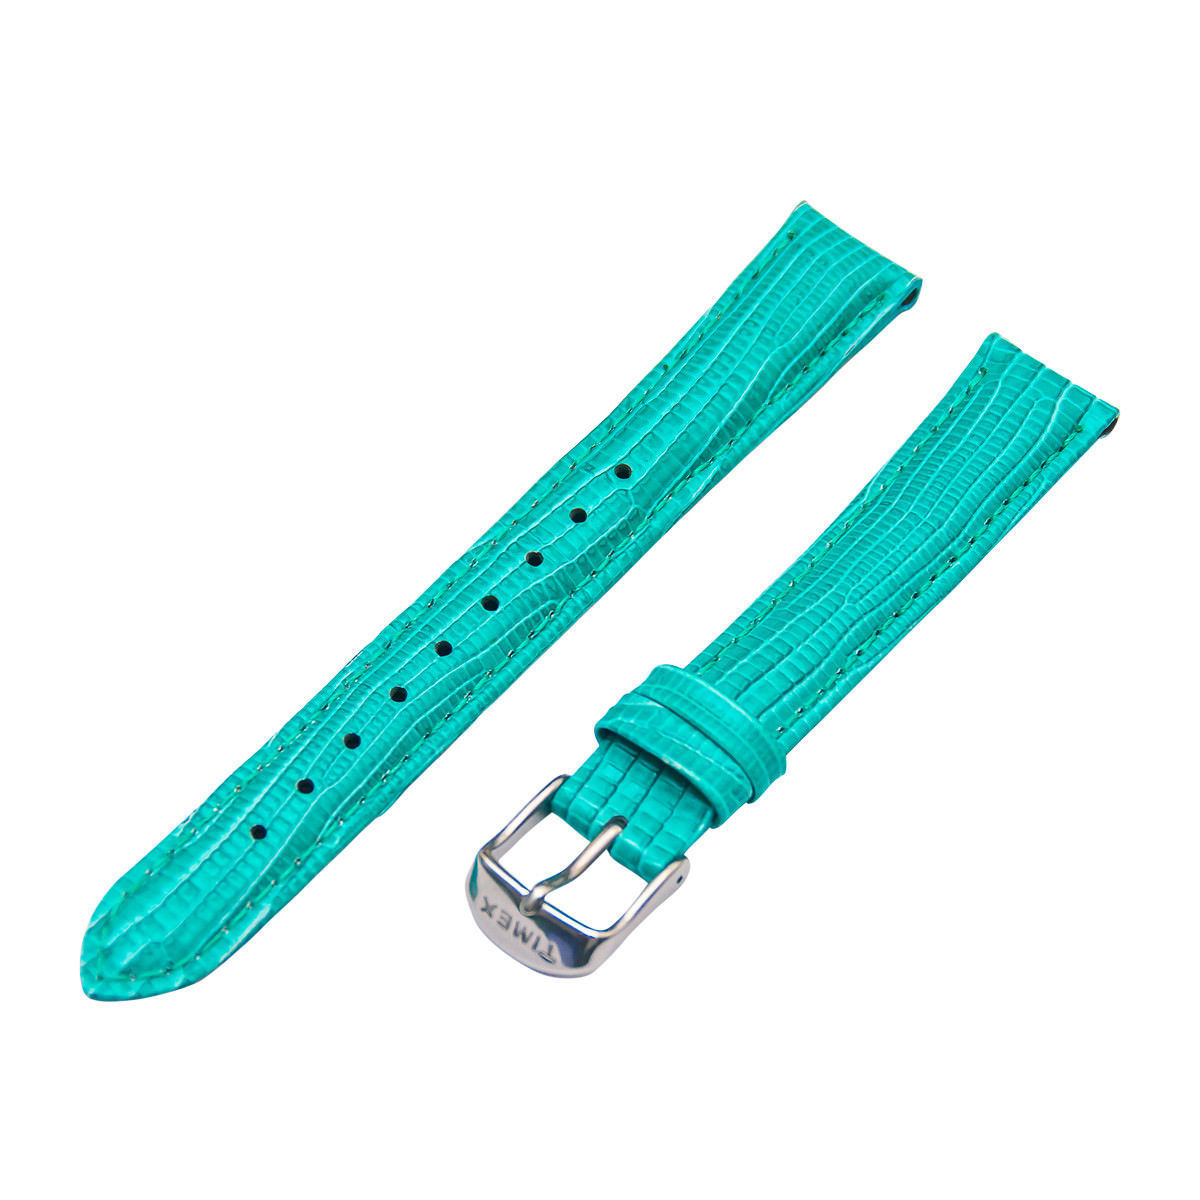 dfc4ab5887b4 Timex Mujer T7B949 16mm Turquesa Piel Lagarto Cuero Repuesto Correa de Reloj